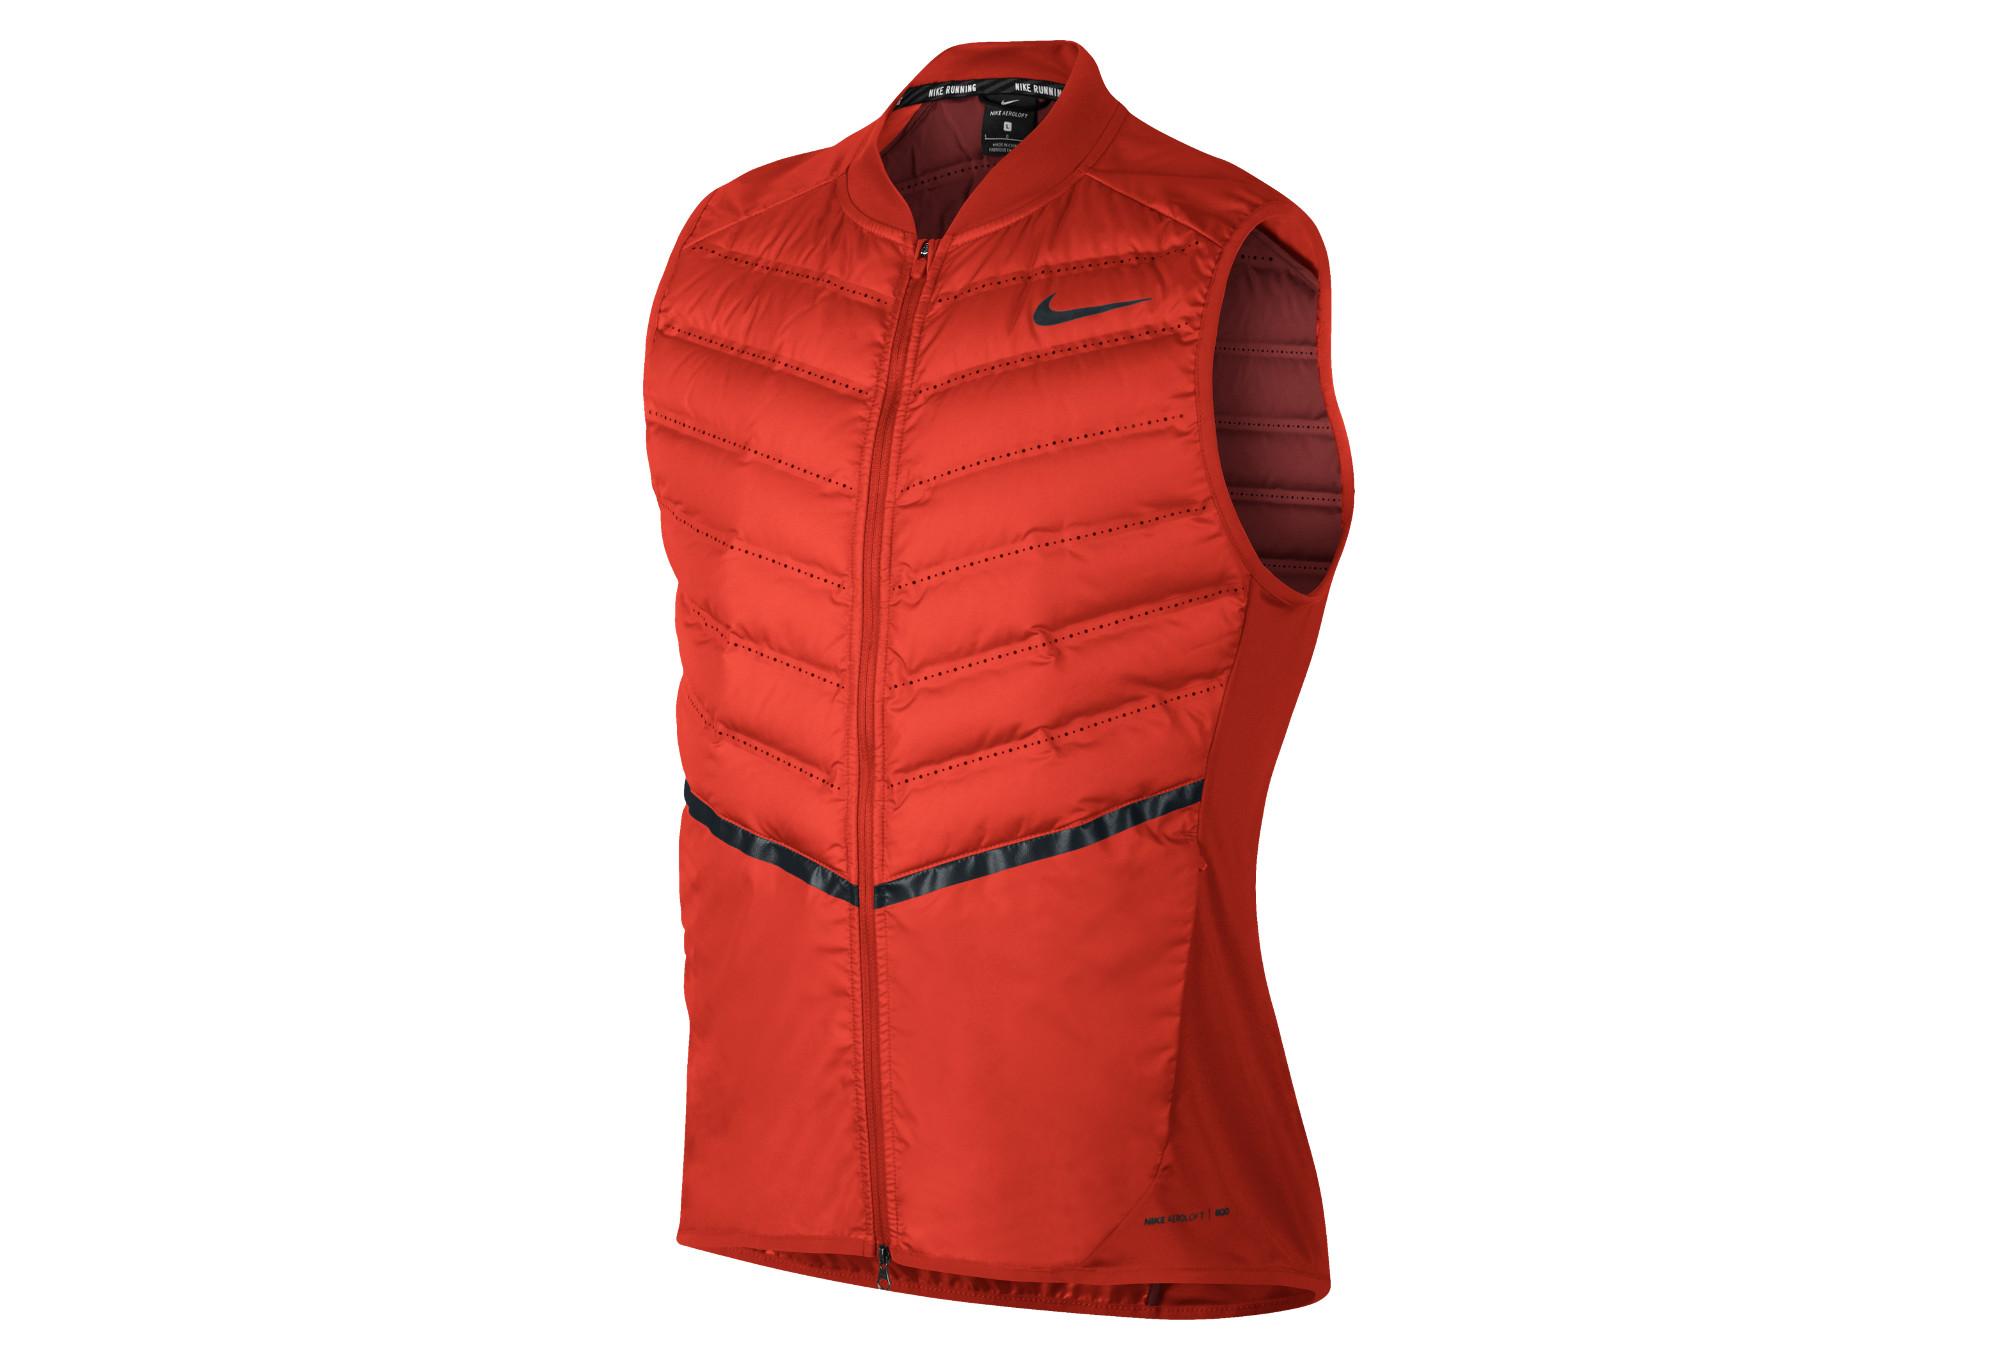 Veste Veste Rouge Nike Aeroloft Homme Homme TOrBwq7T